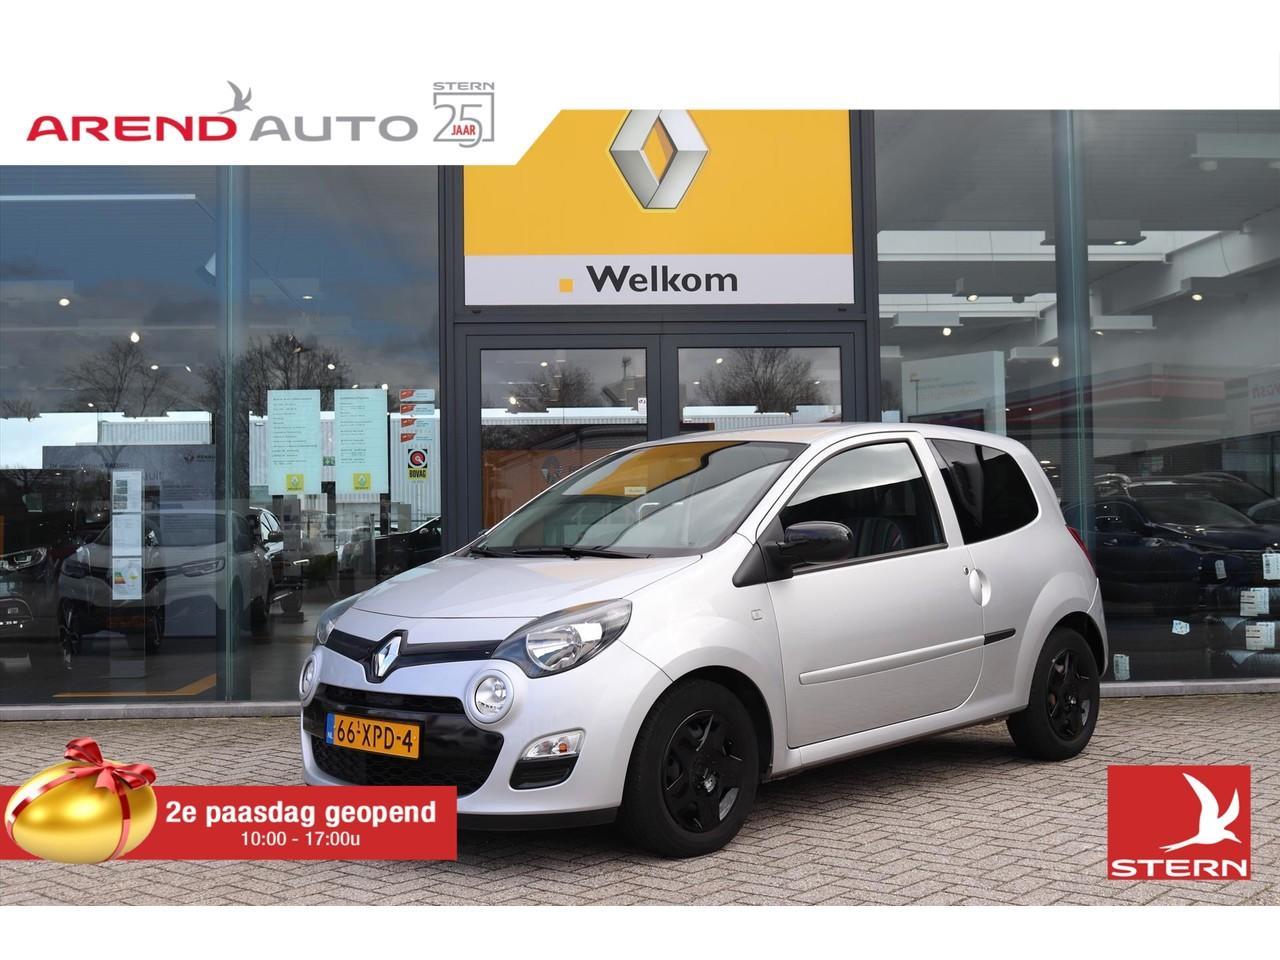 Renault Twingo 1.2 75pk collection